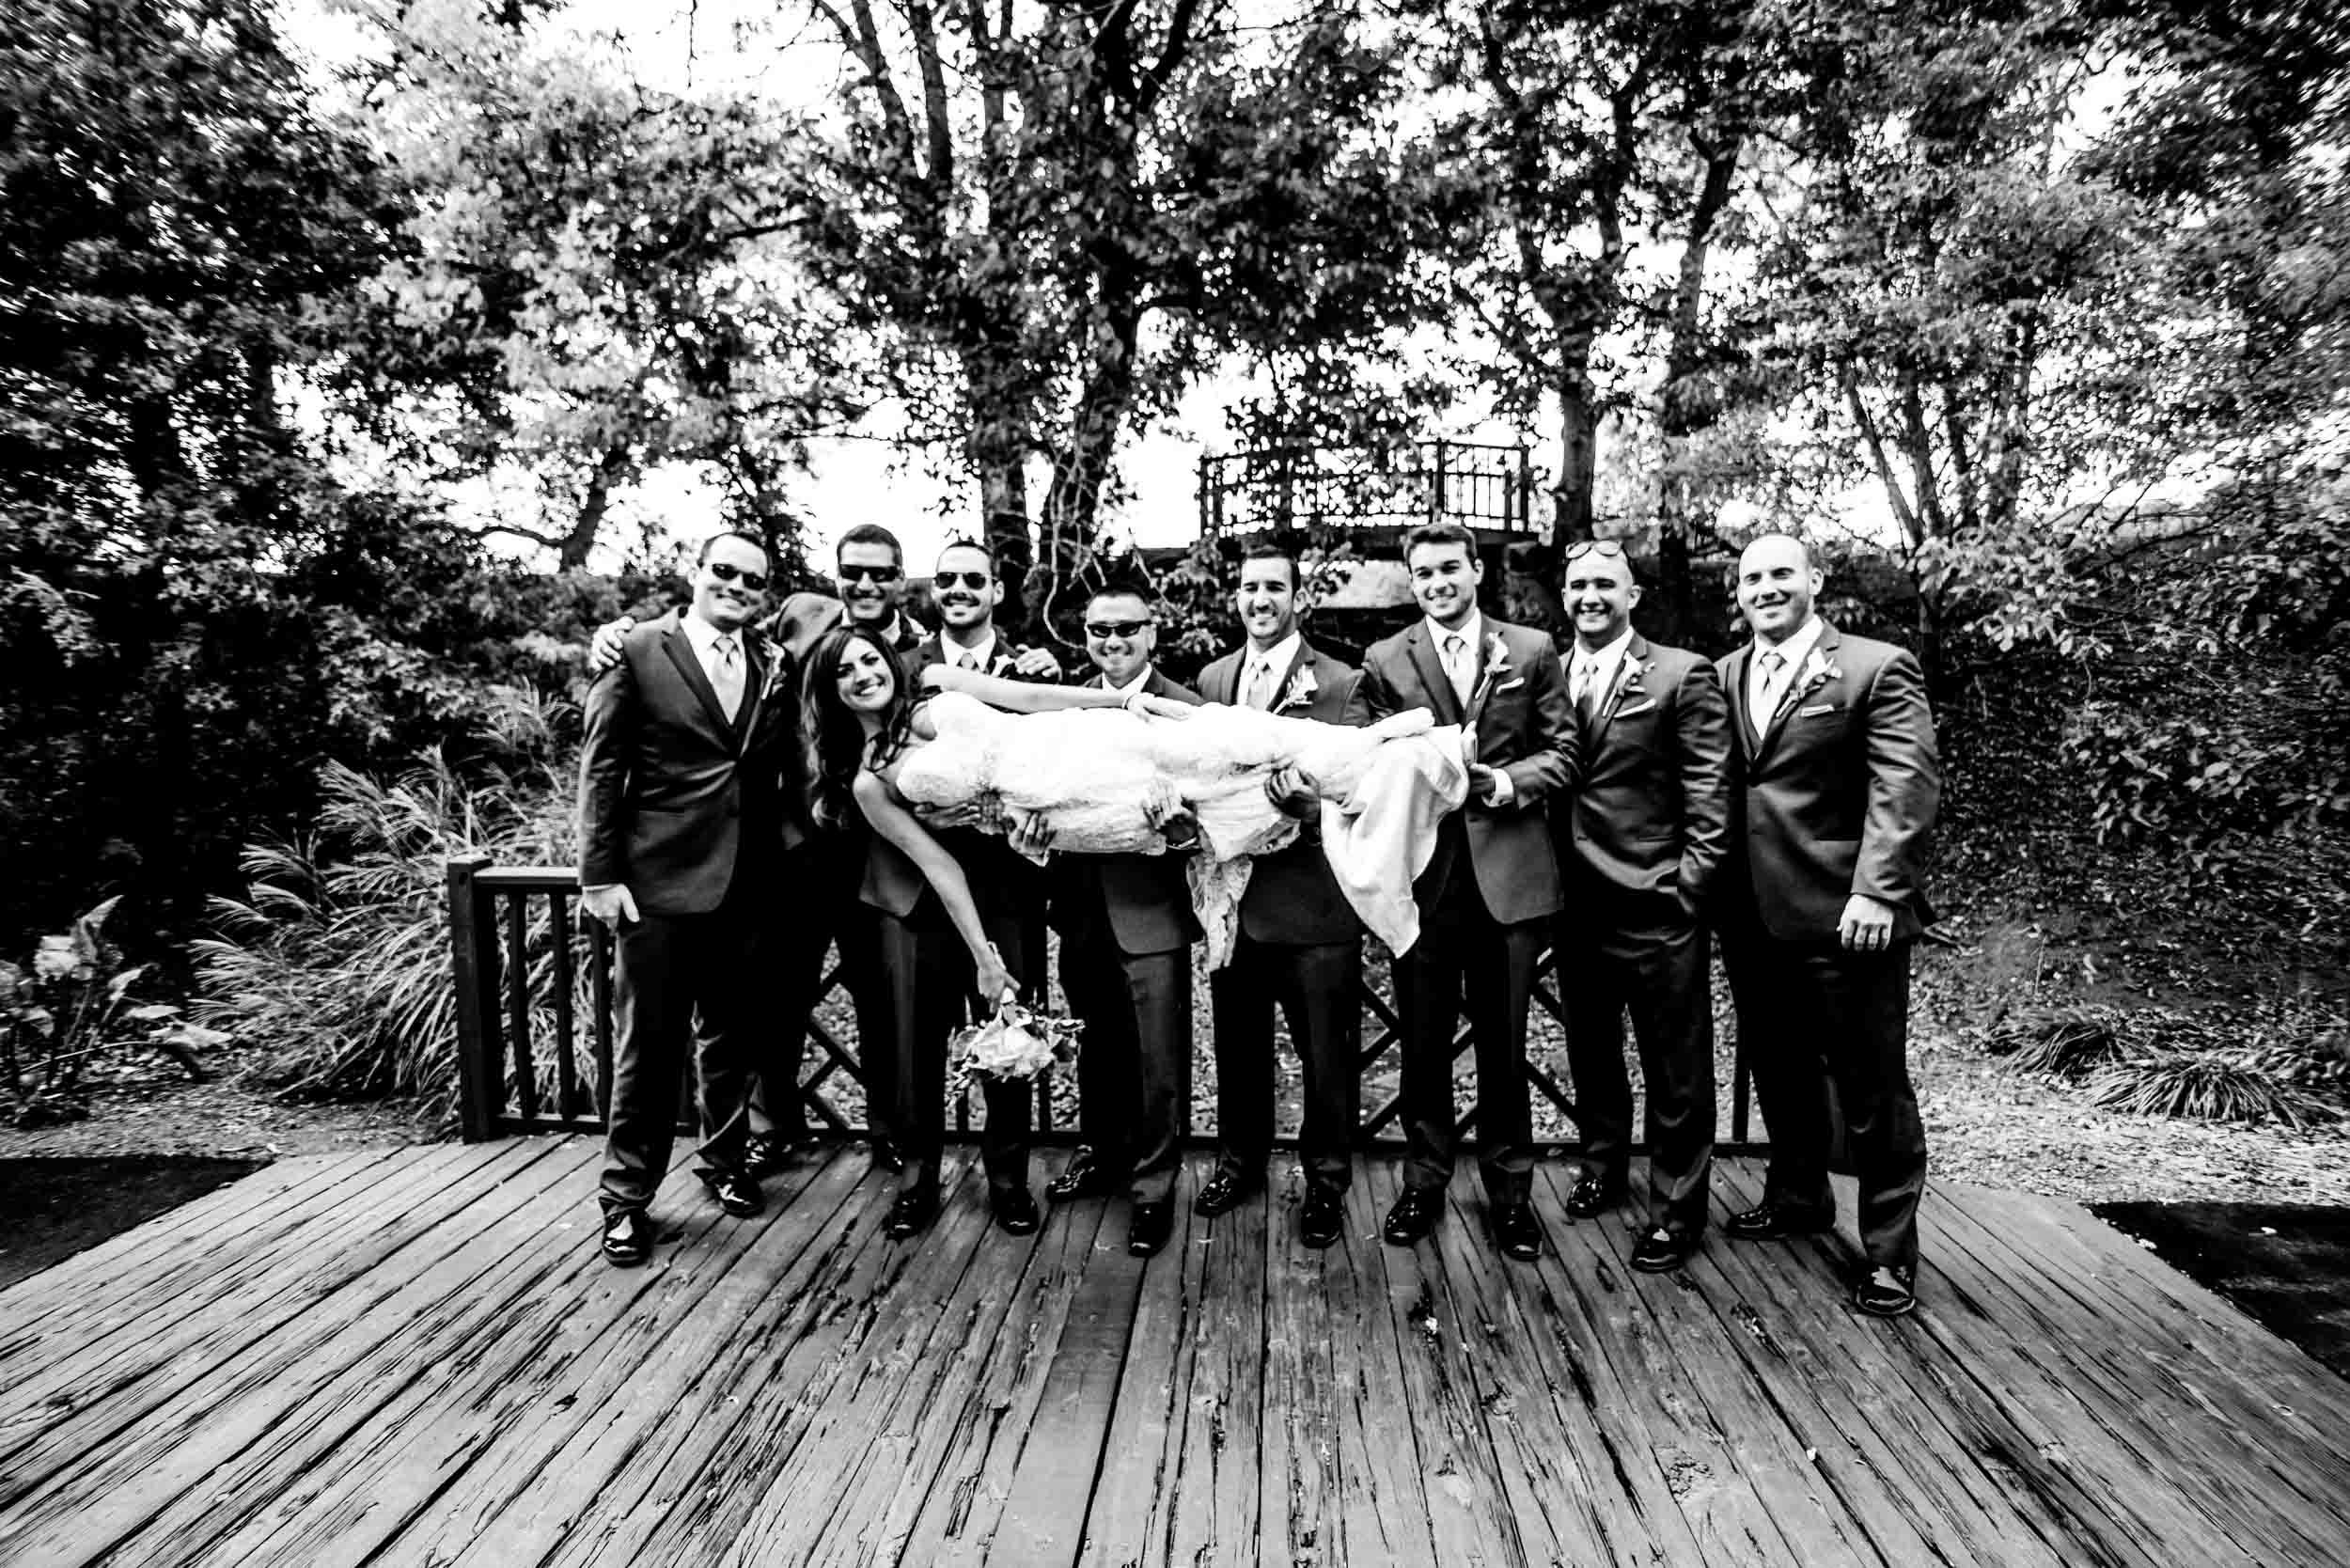 dc+metro+wedding+photographer+vadym+guliuk+photography+wedding+party-2022.jpg